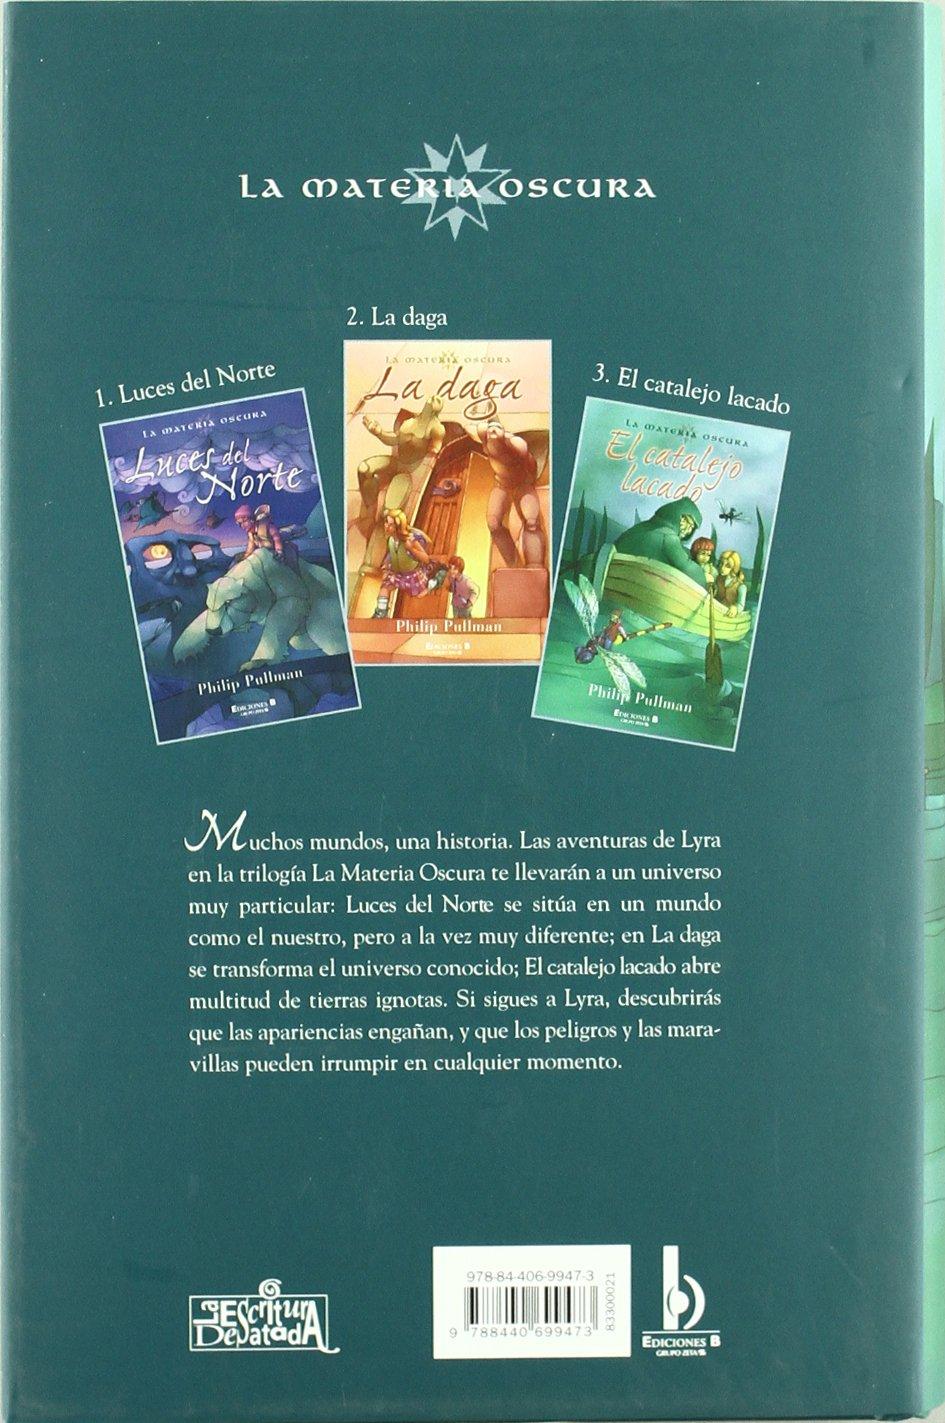 Amazon.com: Materia oscura: El catalejo lacado (His Dark Materials)  (Spanish Edition) (9788440699473): Philip Pullman, Maria Dolores Gallart  Iglesias: Books